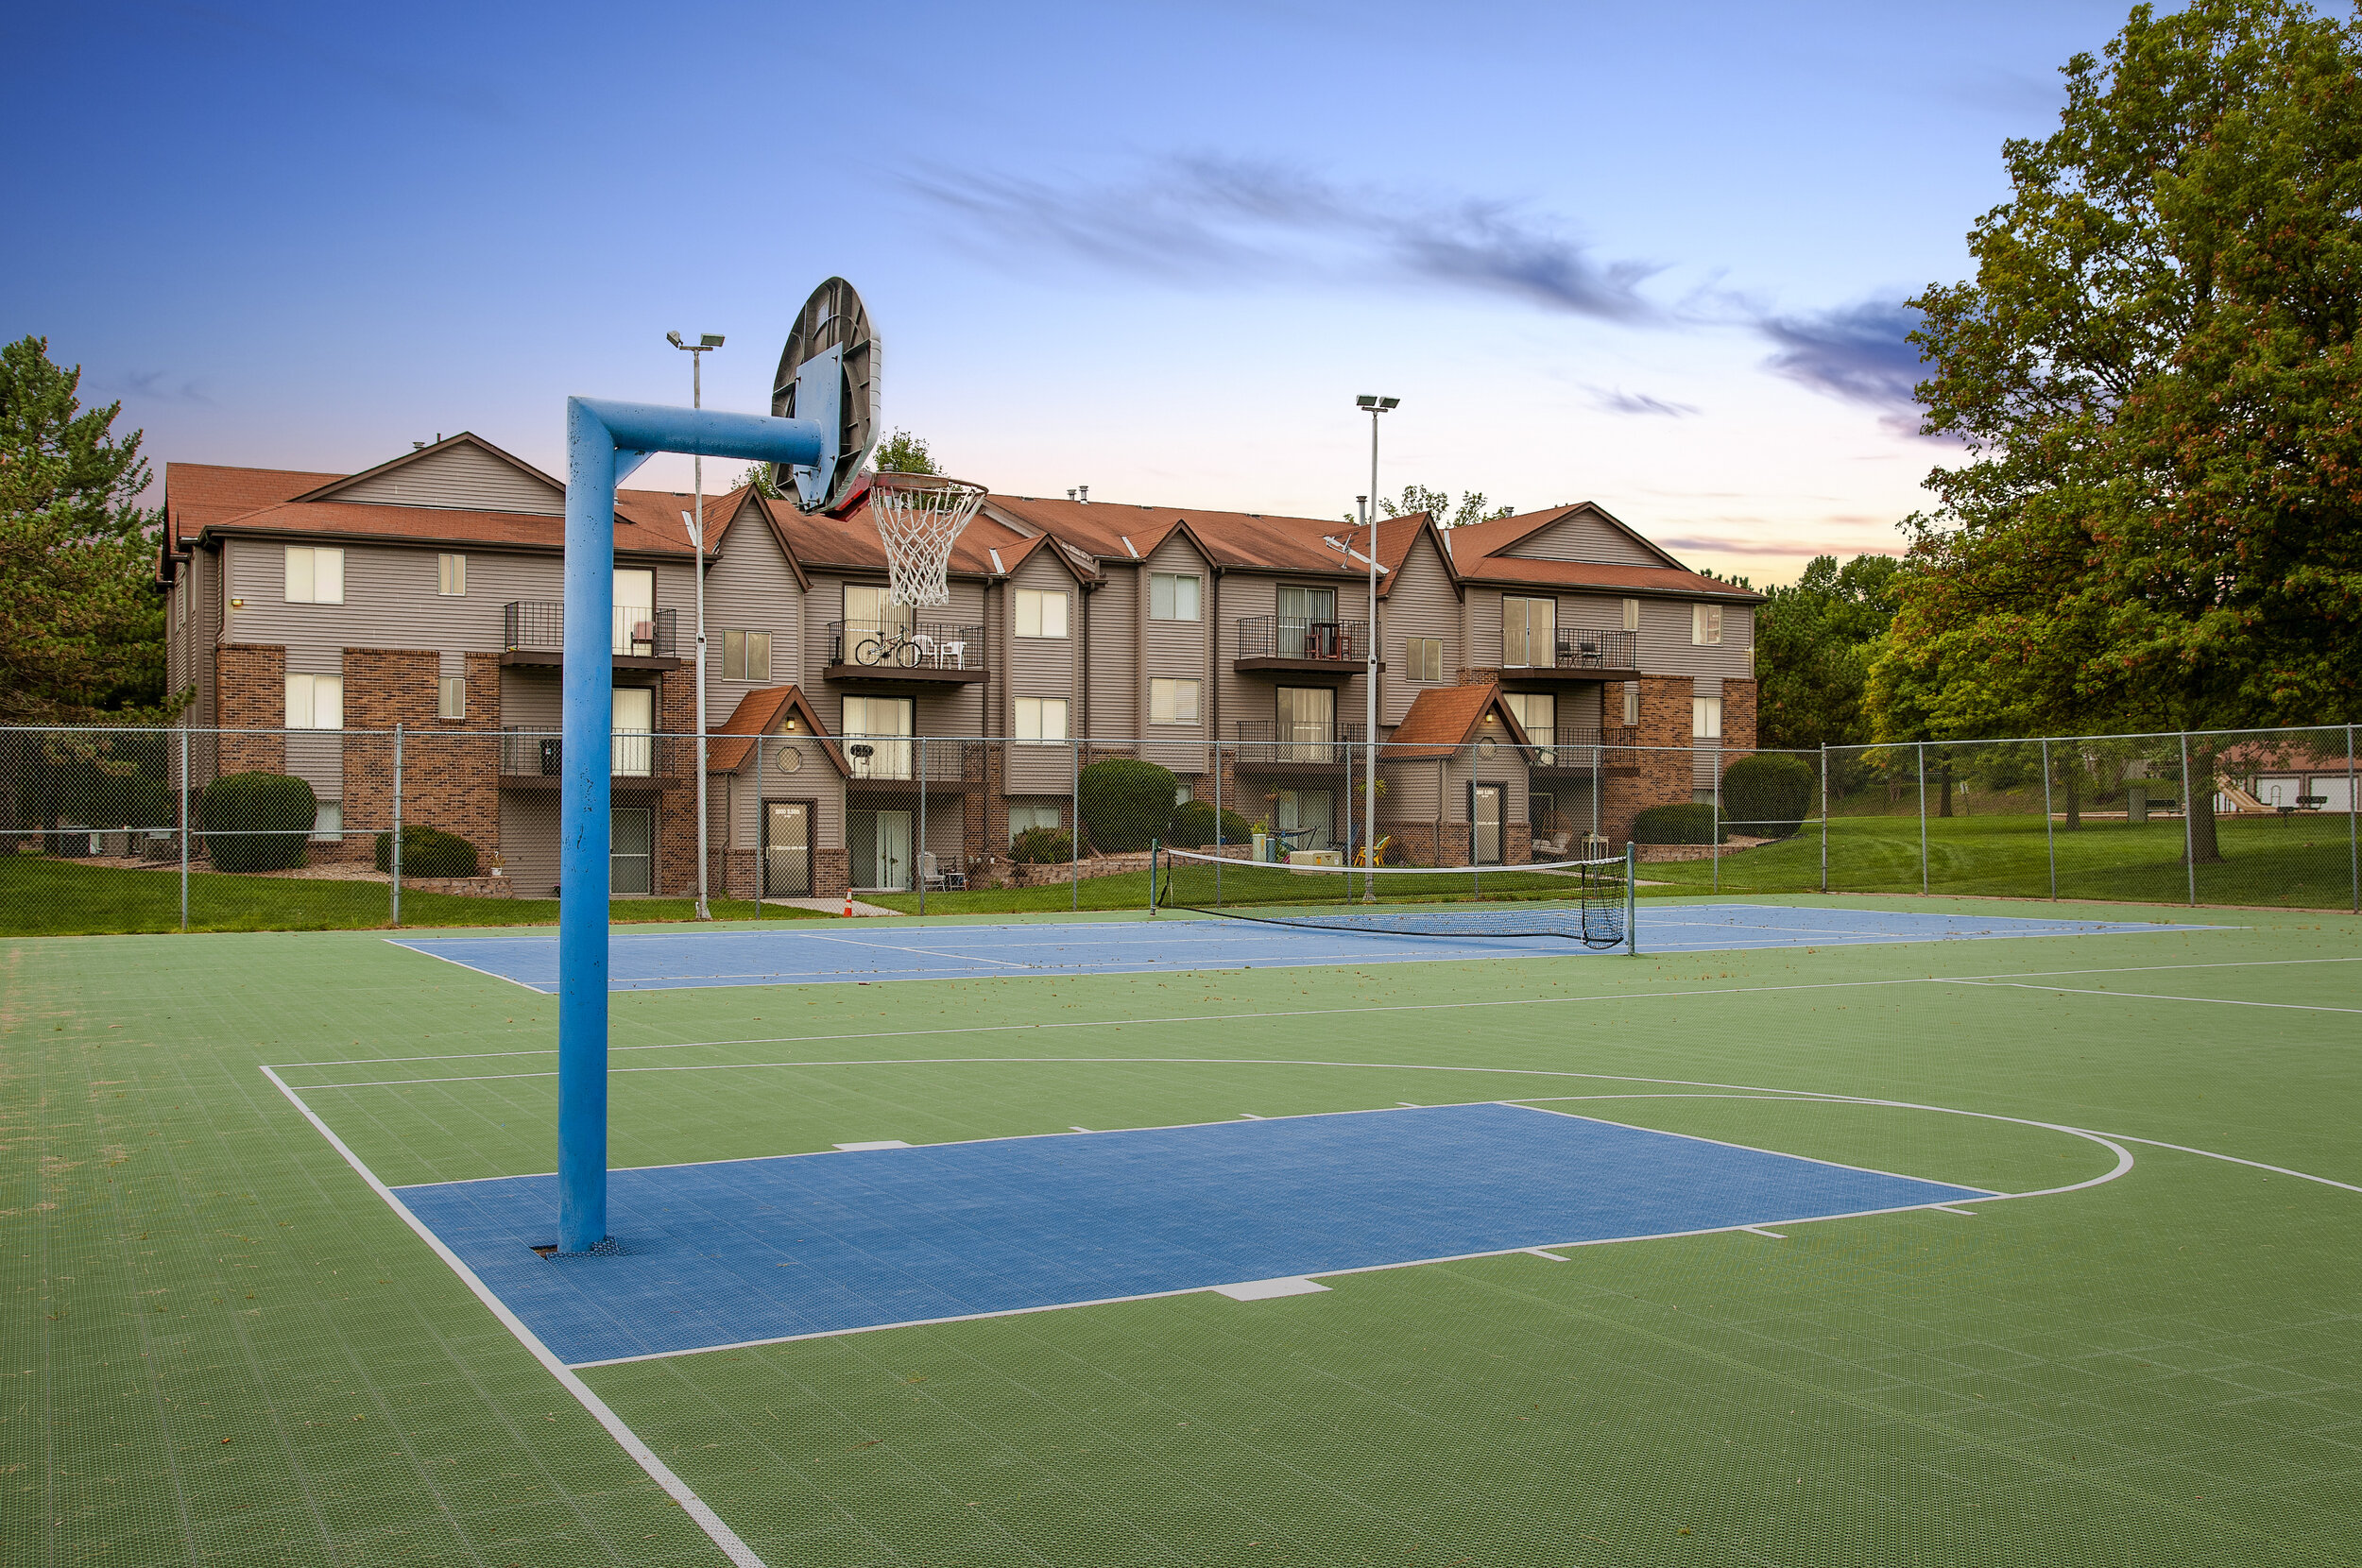 11 Basketball _ Tennis Courts.jpg